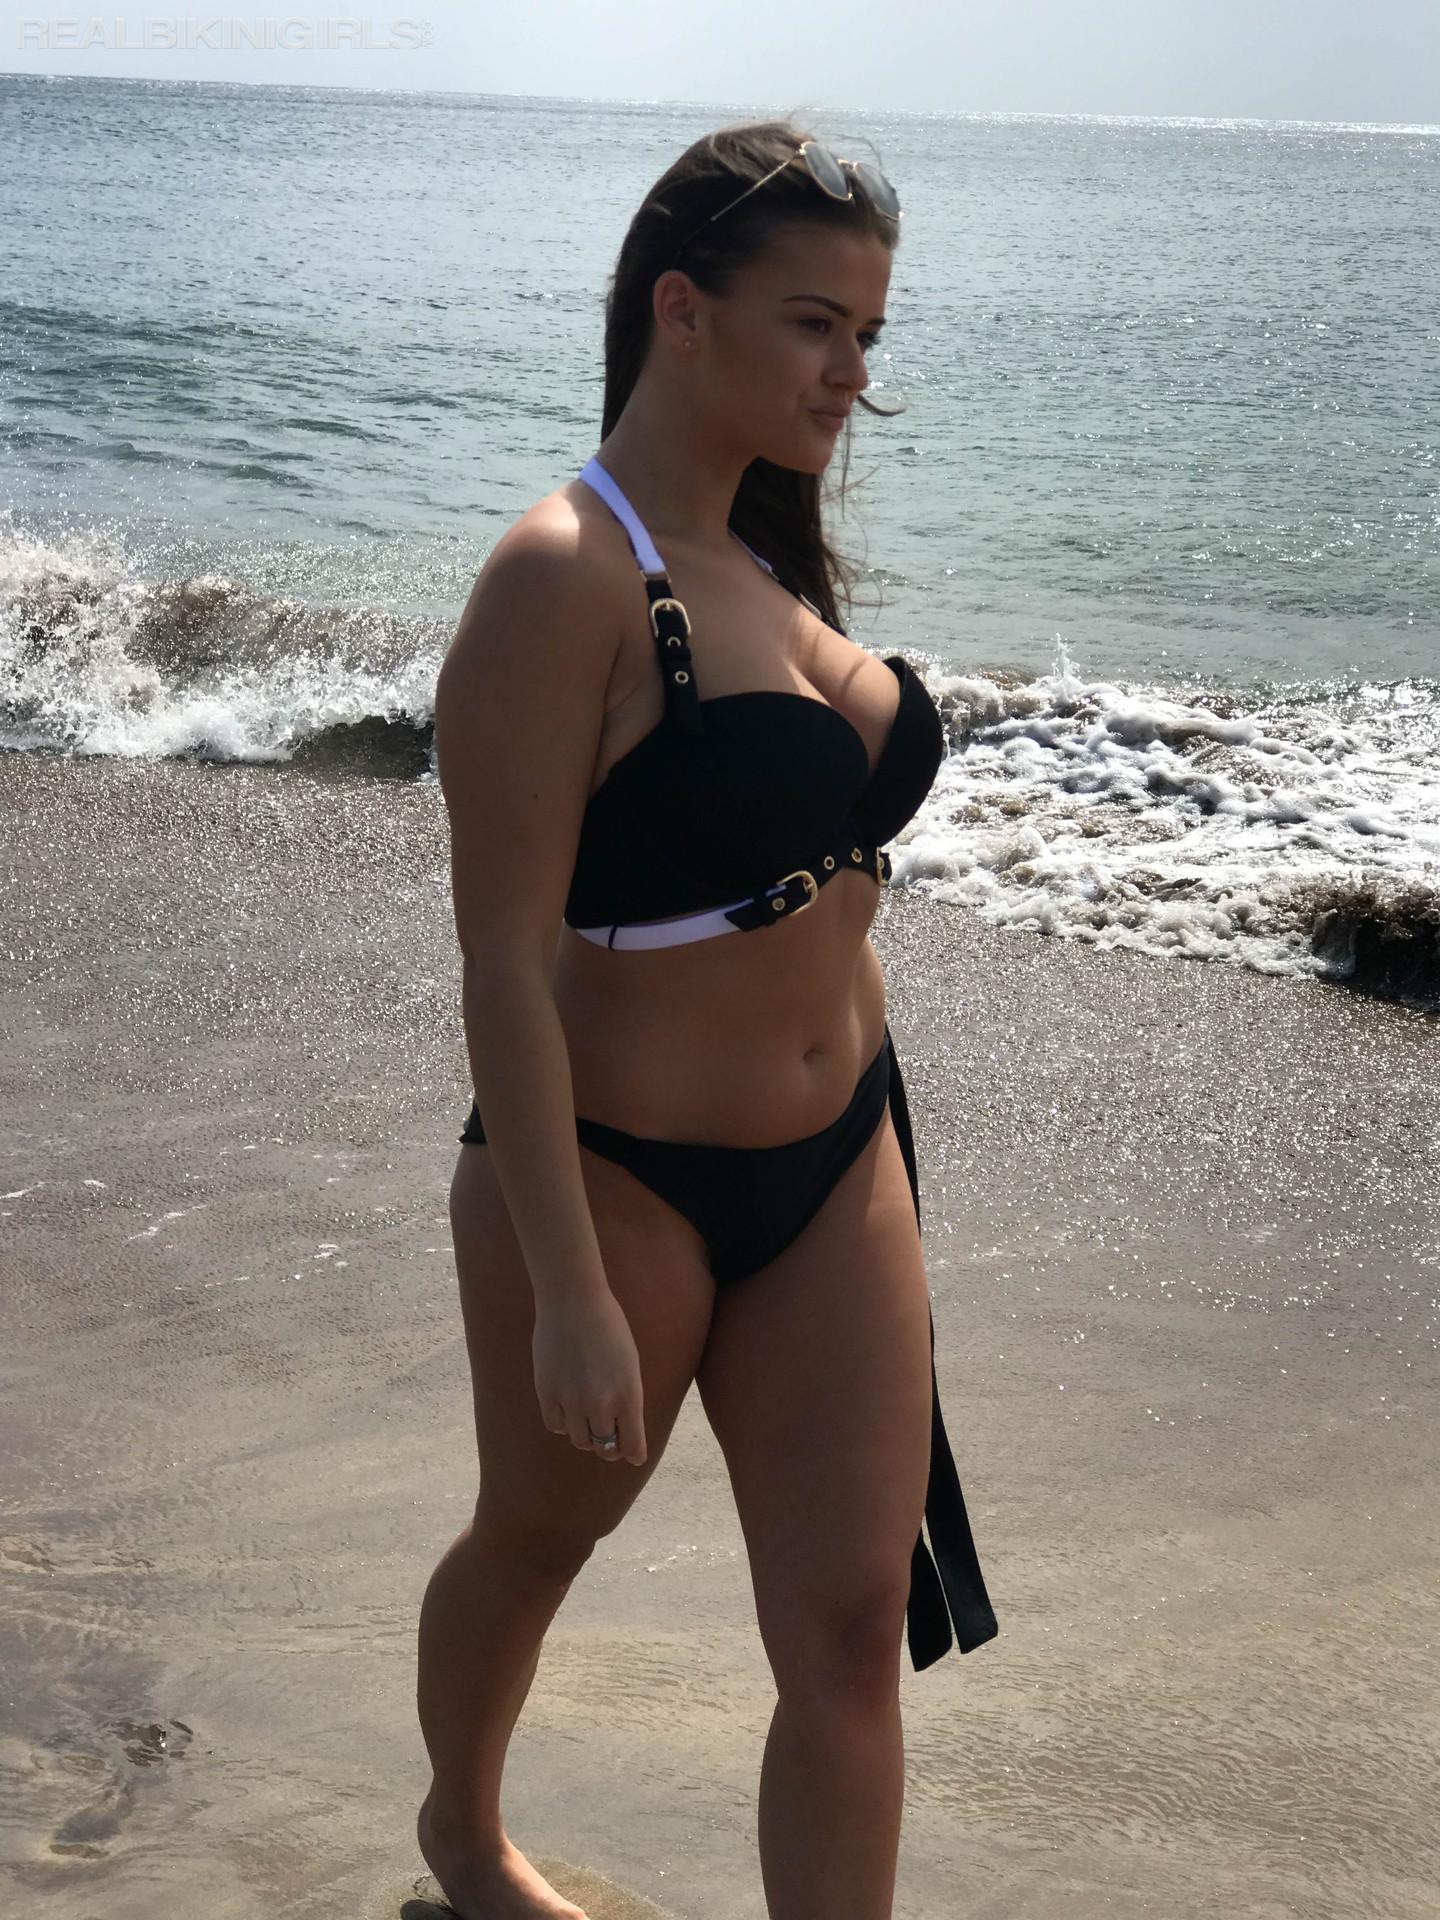 amelia-beach-walker-bts-105